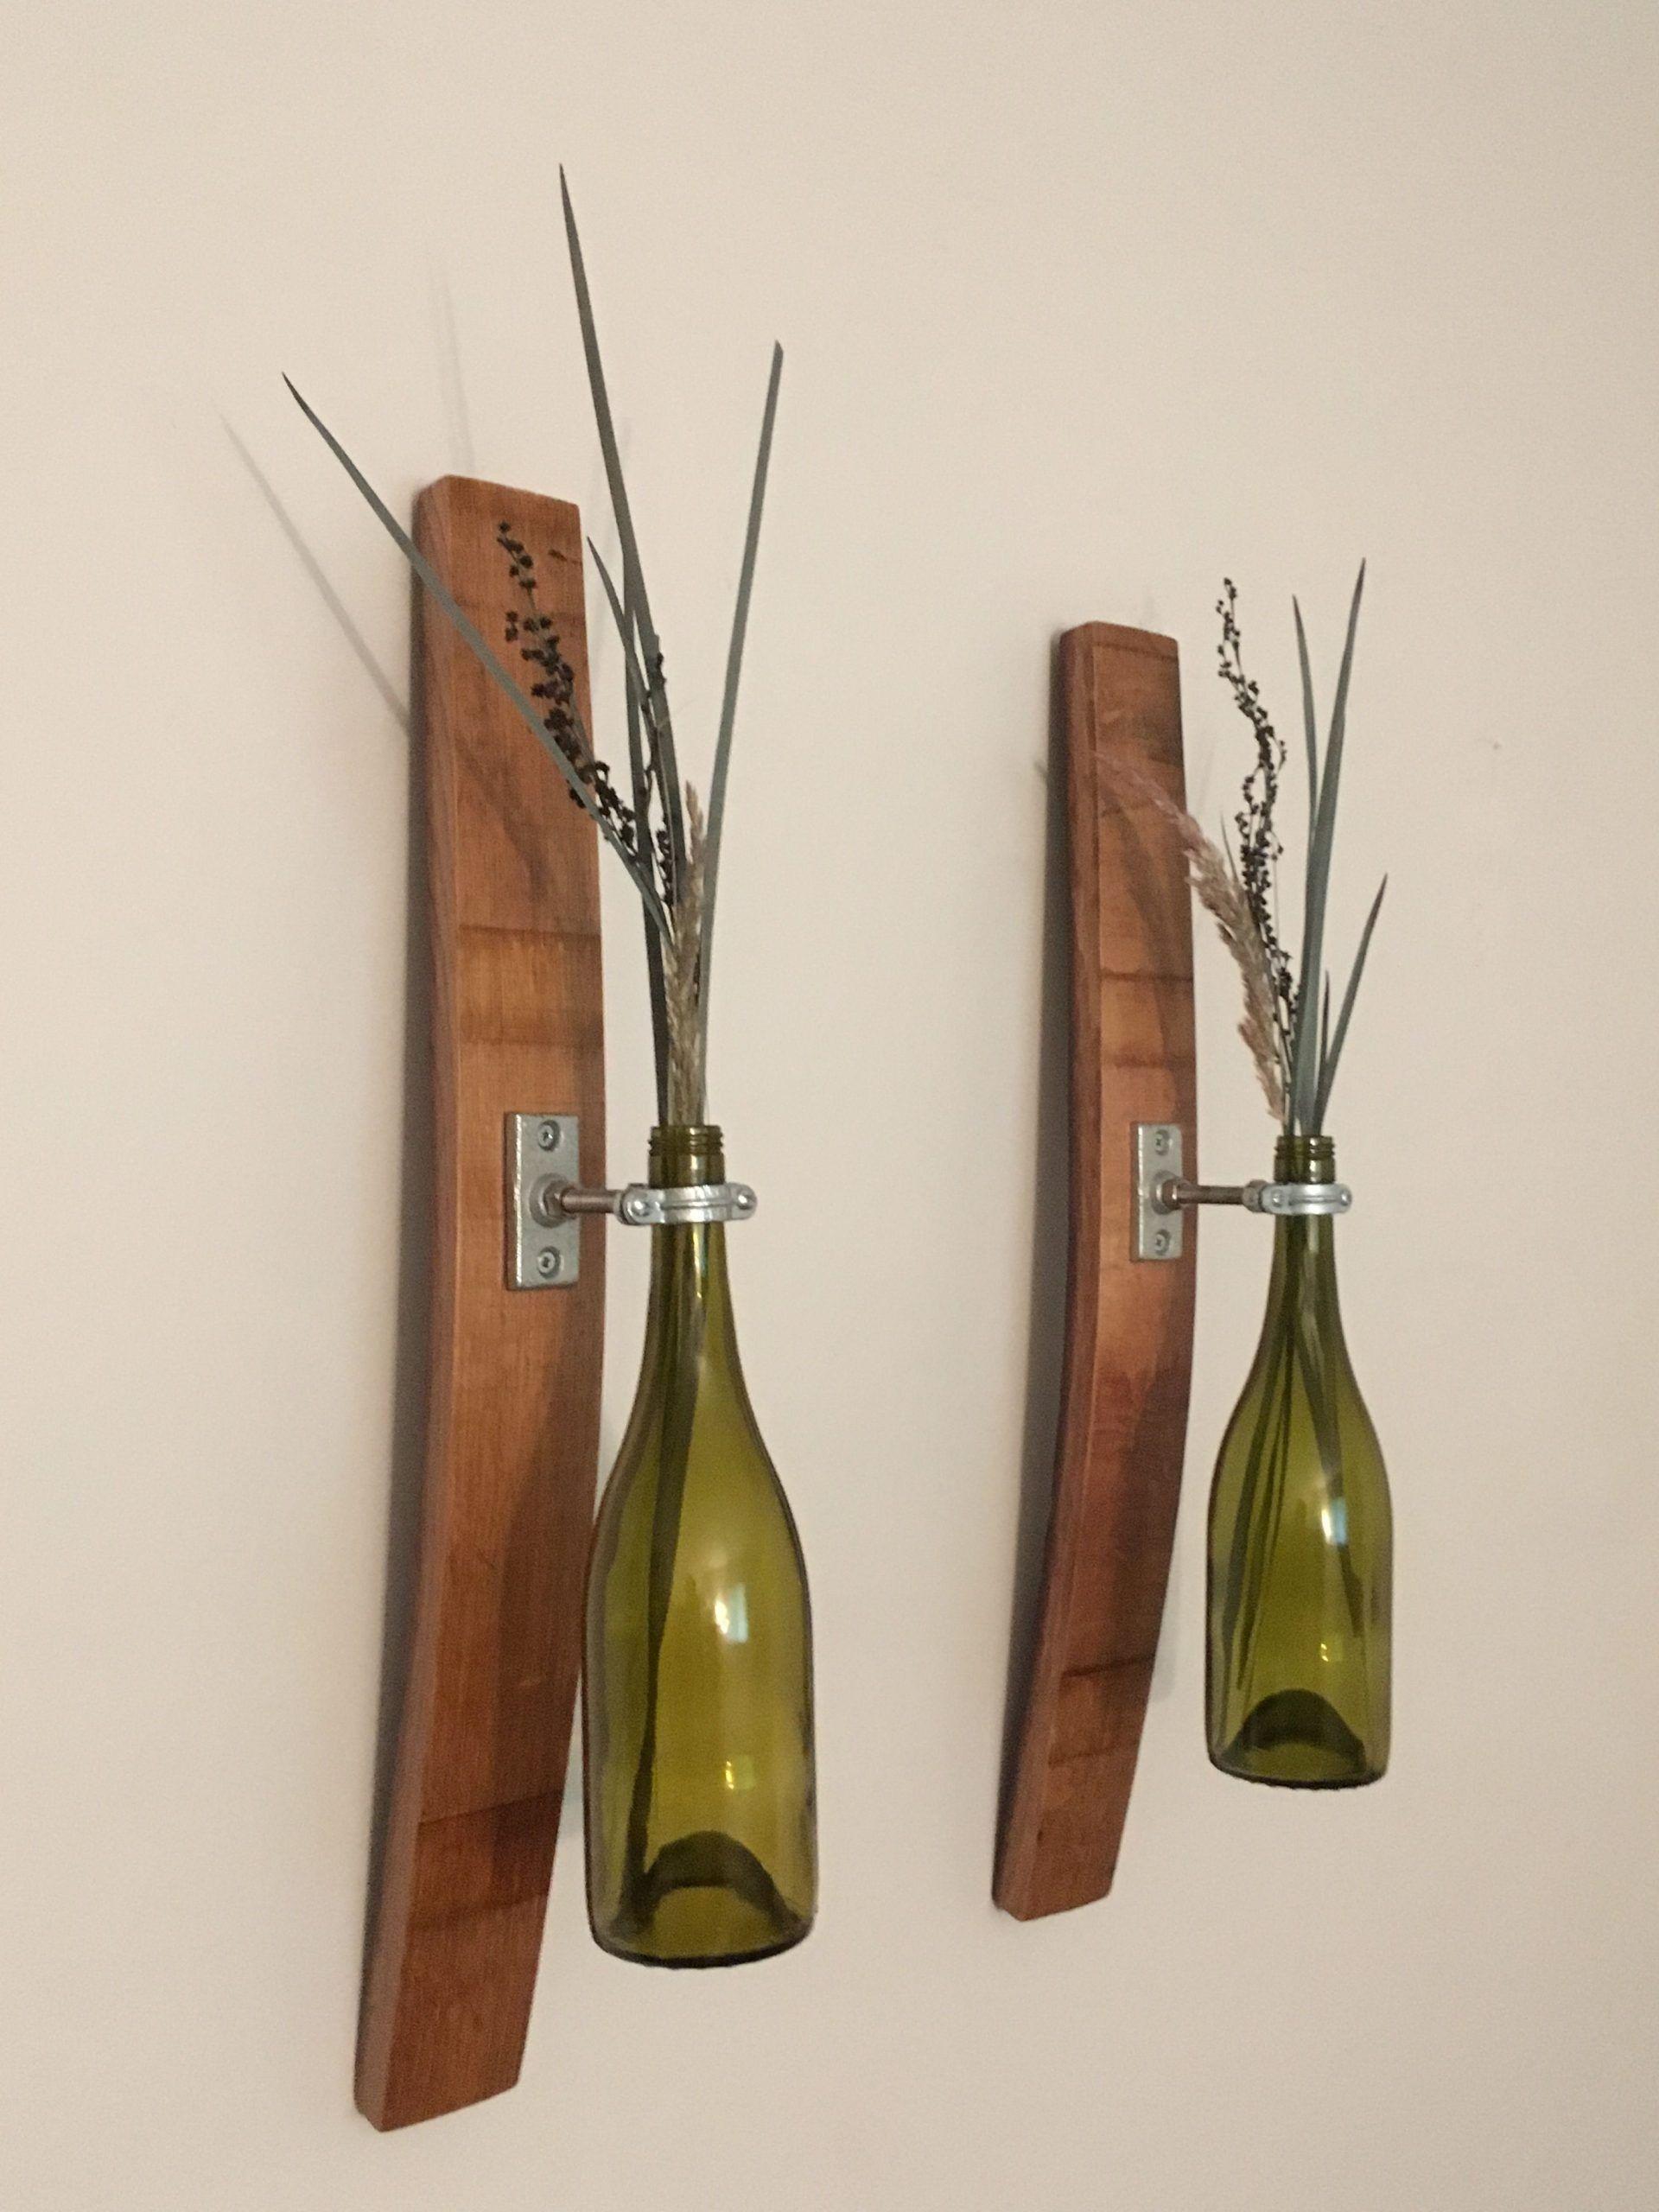 Natural Wine Barrel Centerpiece Set with Glasses